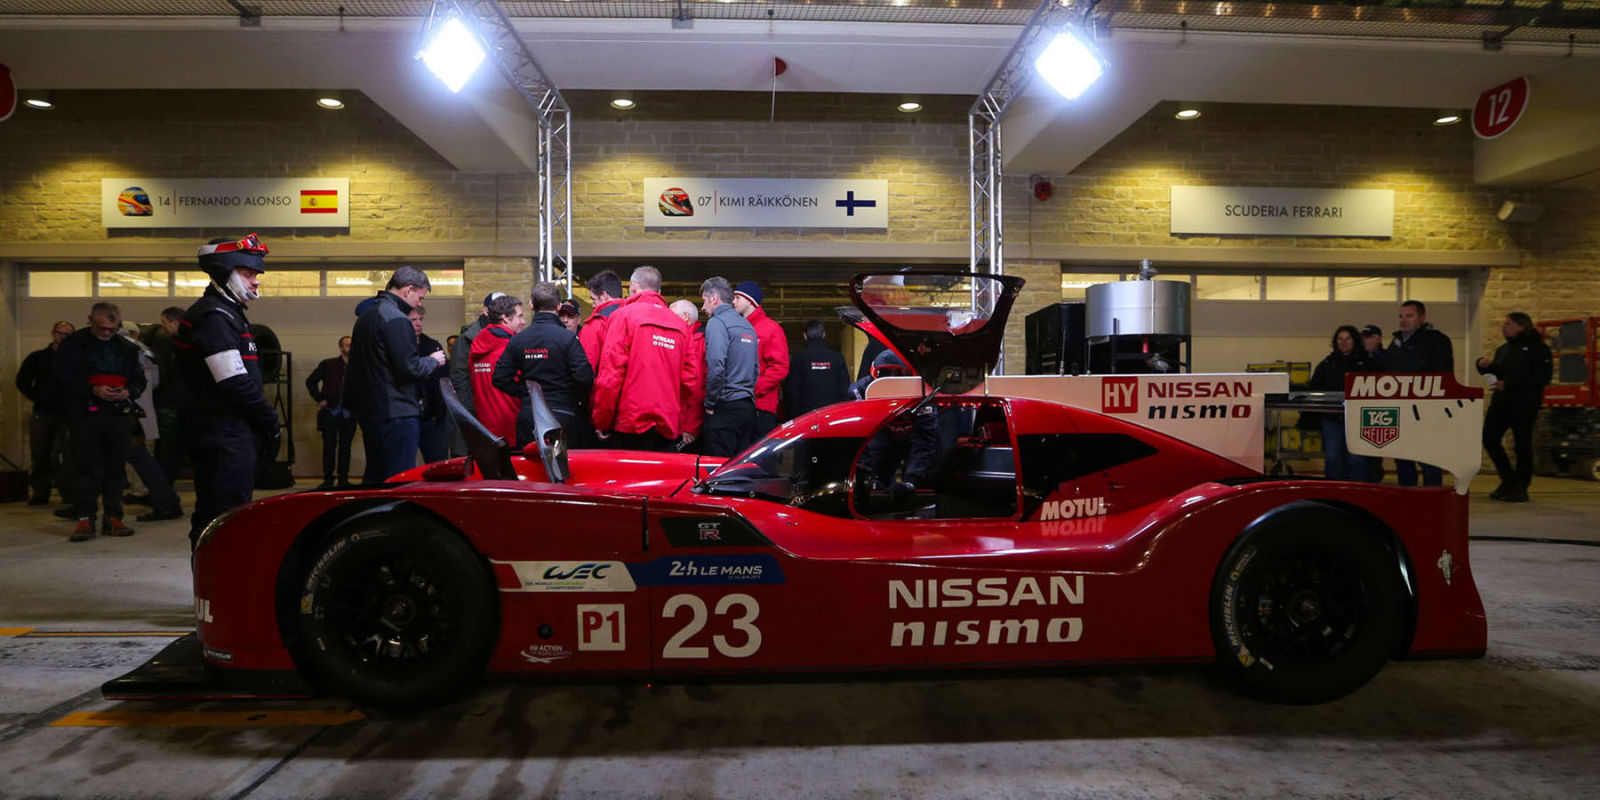 Nissan - Motorsport Lineup 2015 mit WEC, Le Mans, GT